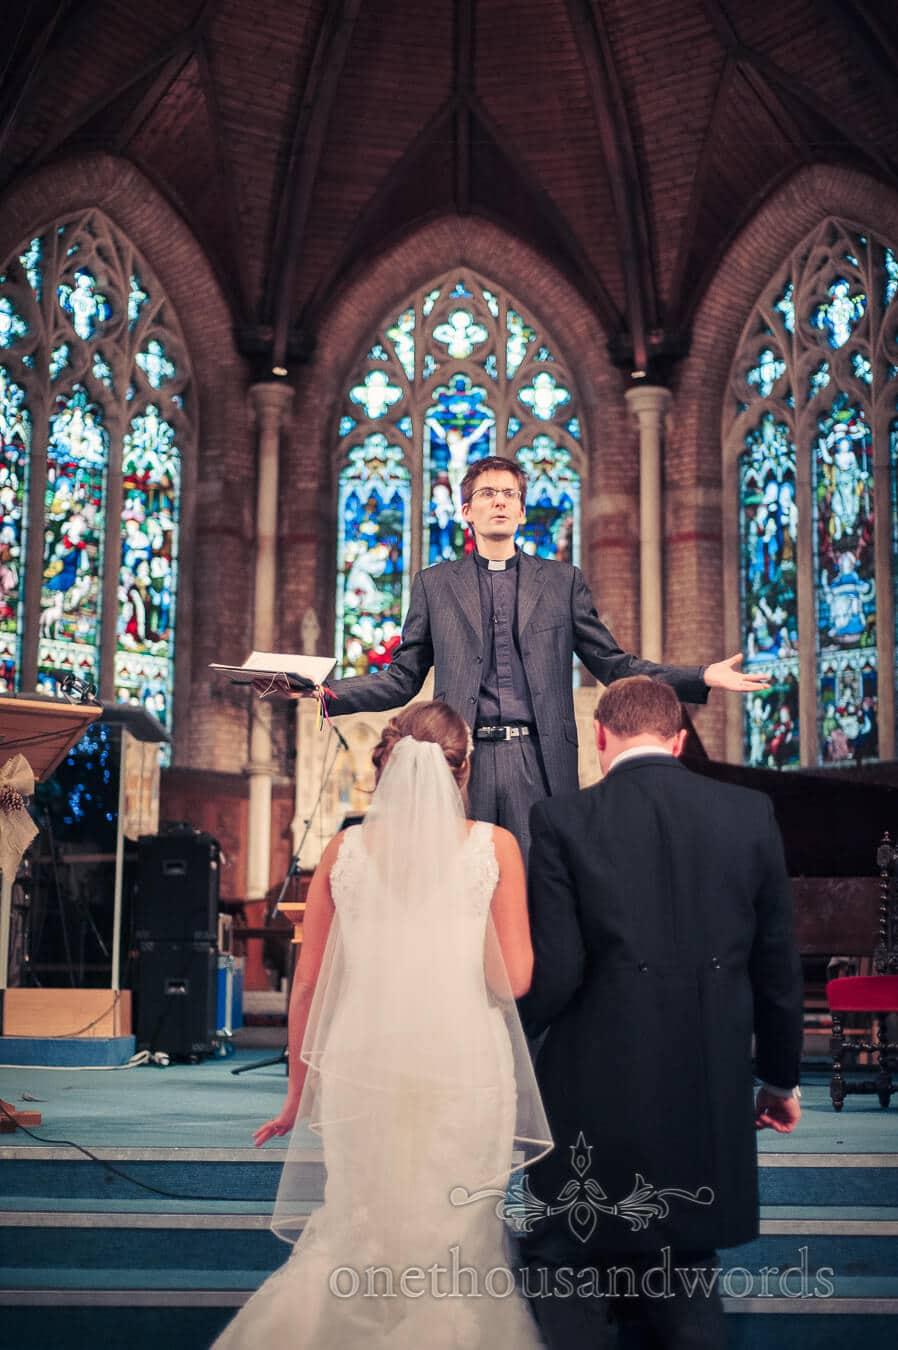 Wedding ceremony in Richmond Church London